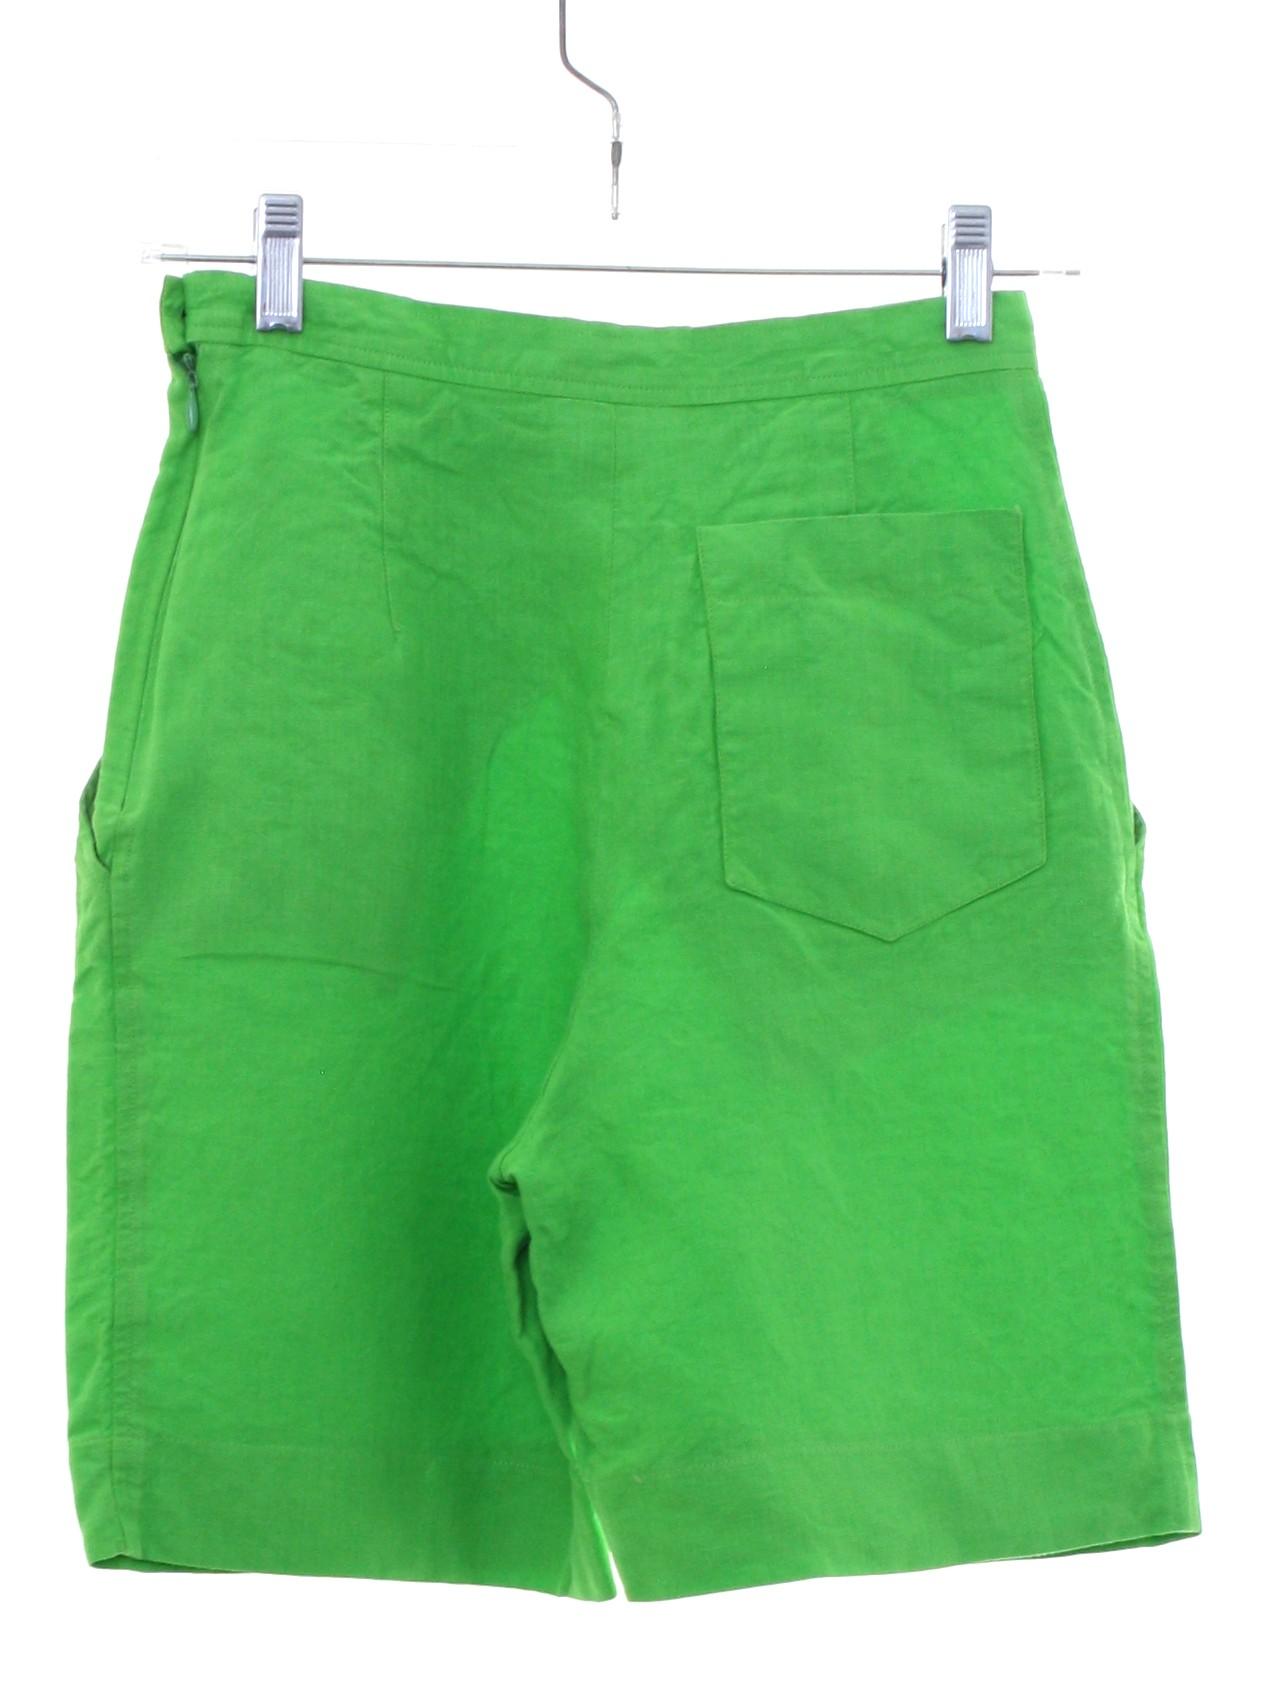 1960/'s Women/'s Shorts